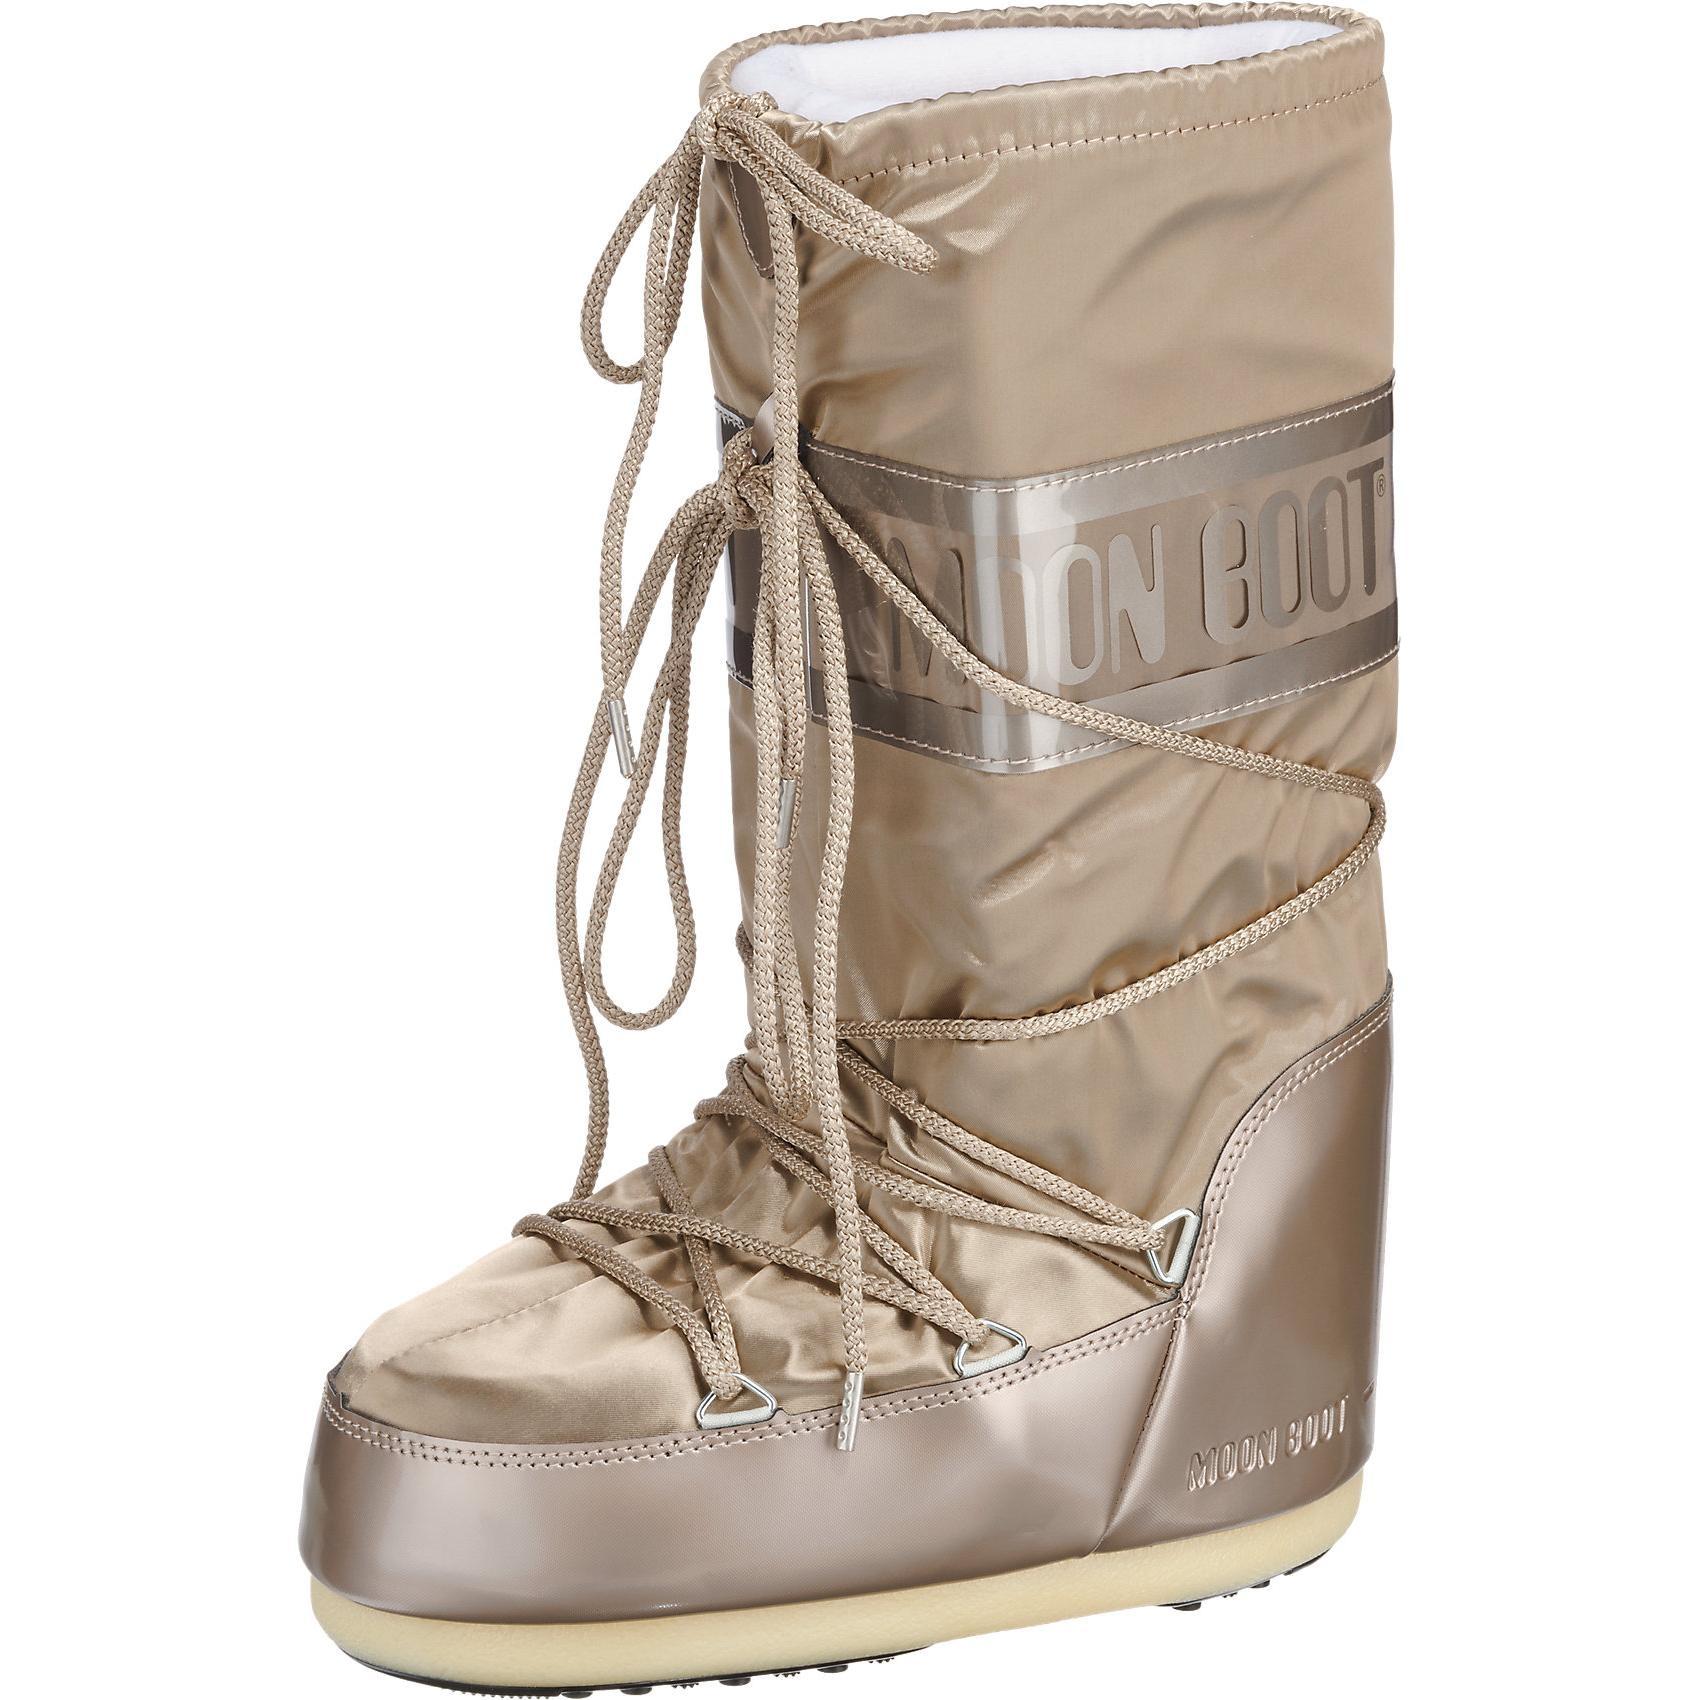 Damen Stiefel & Boots online bestellen » REWE